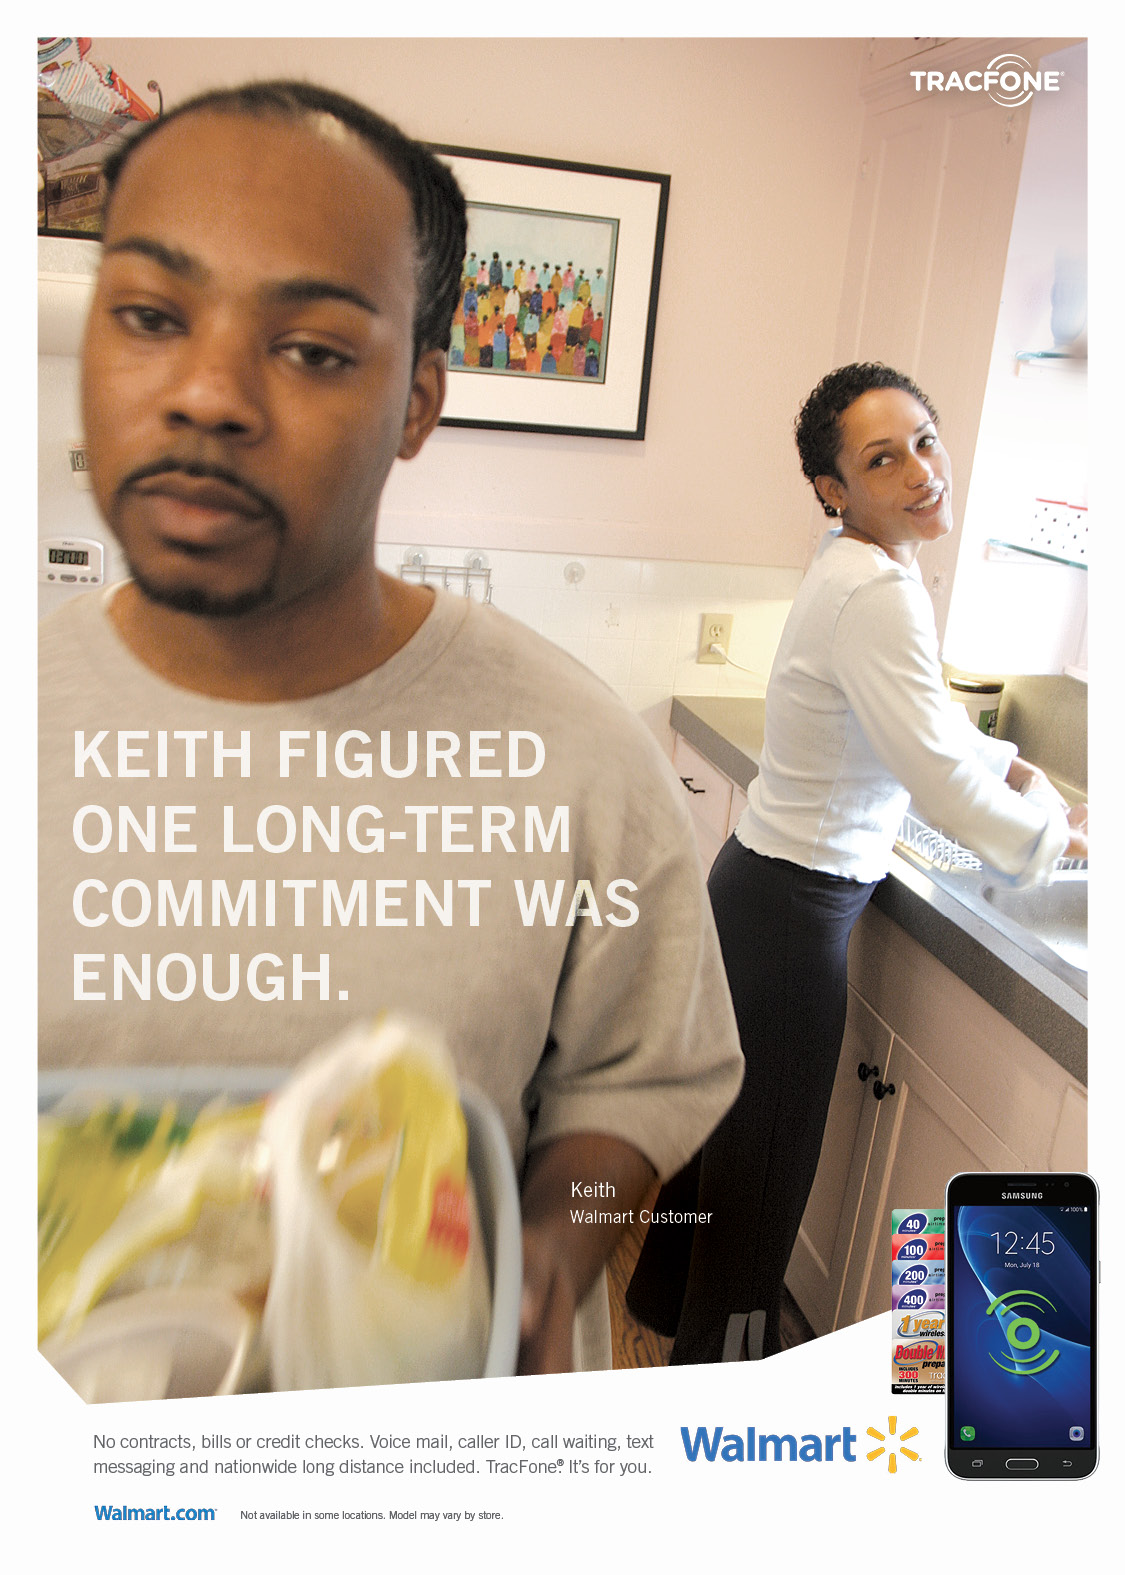 Walmart Keith